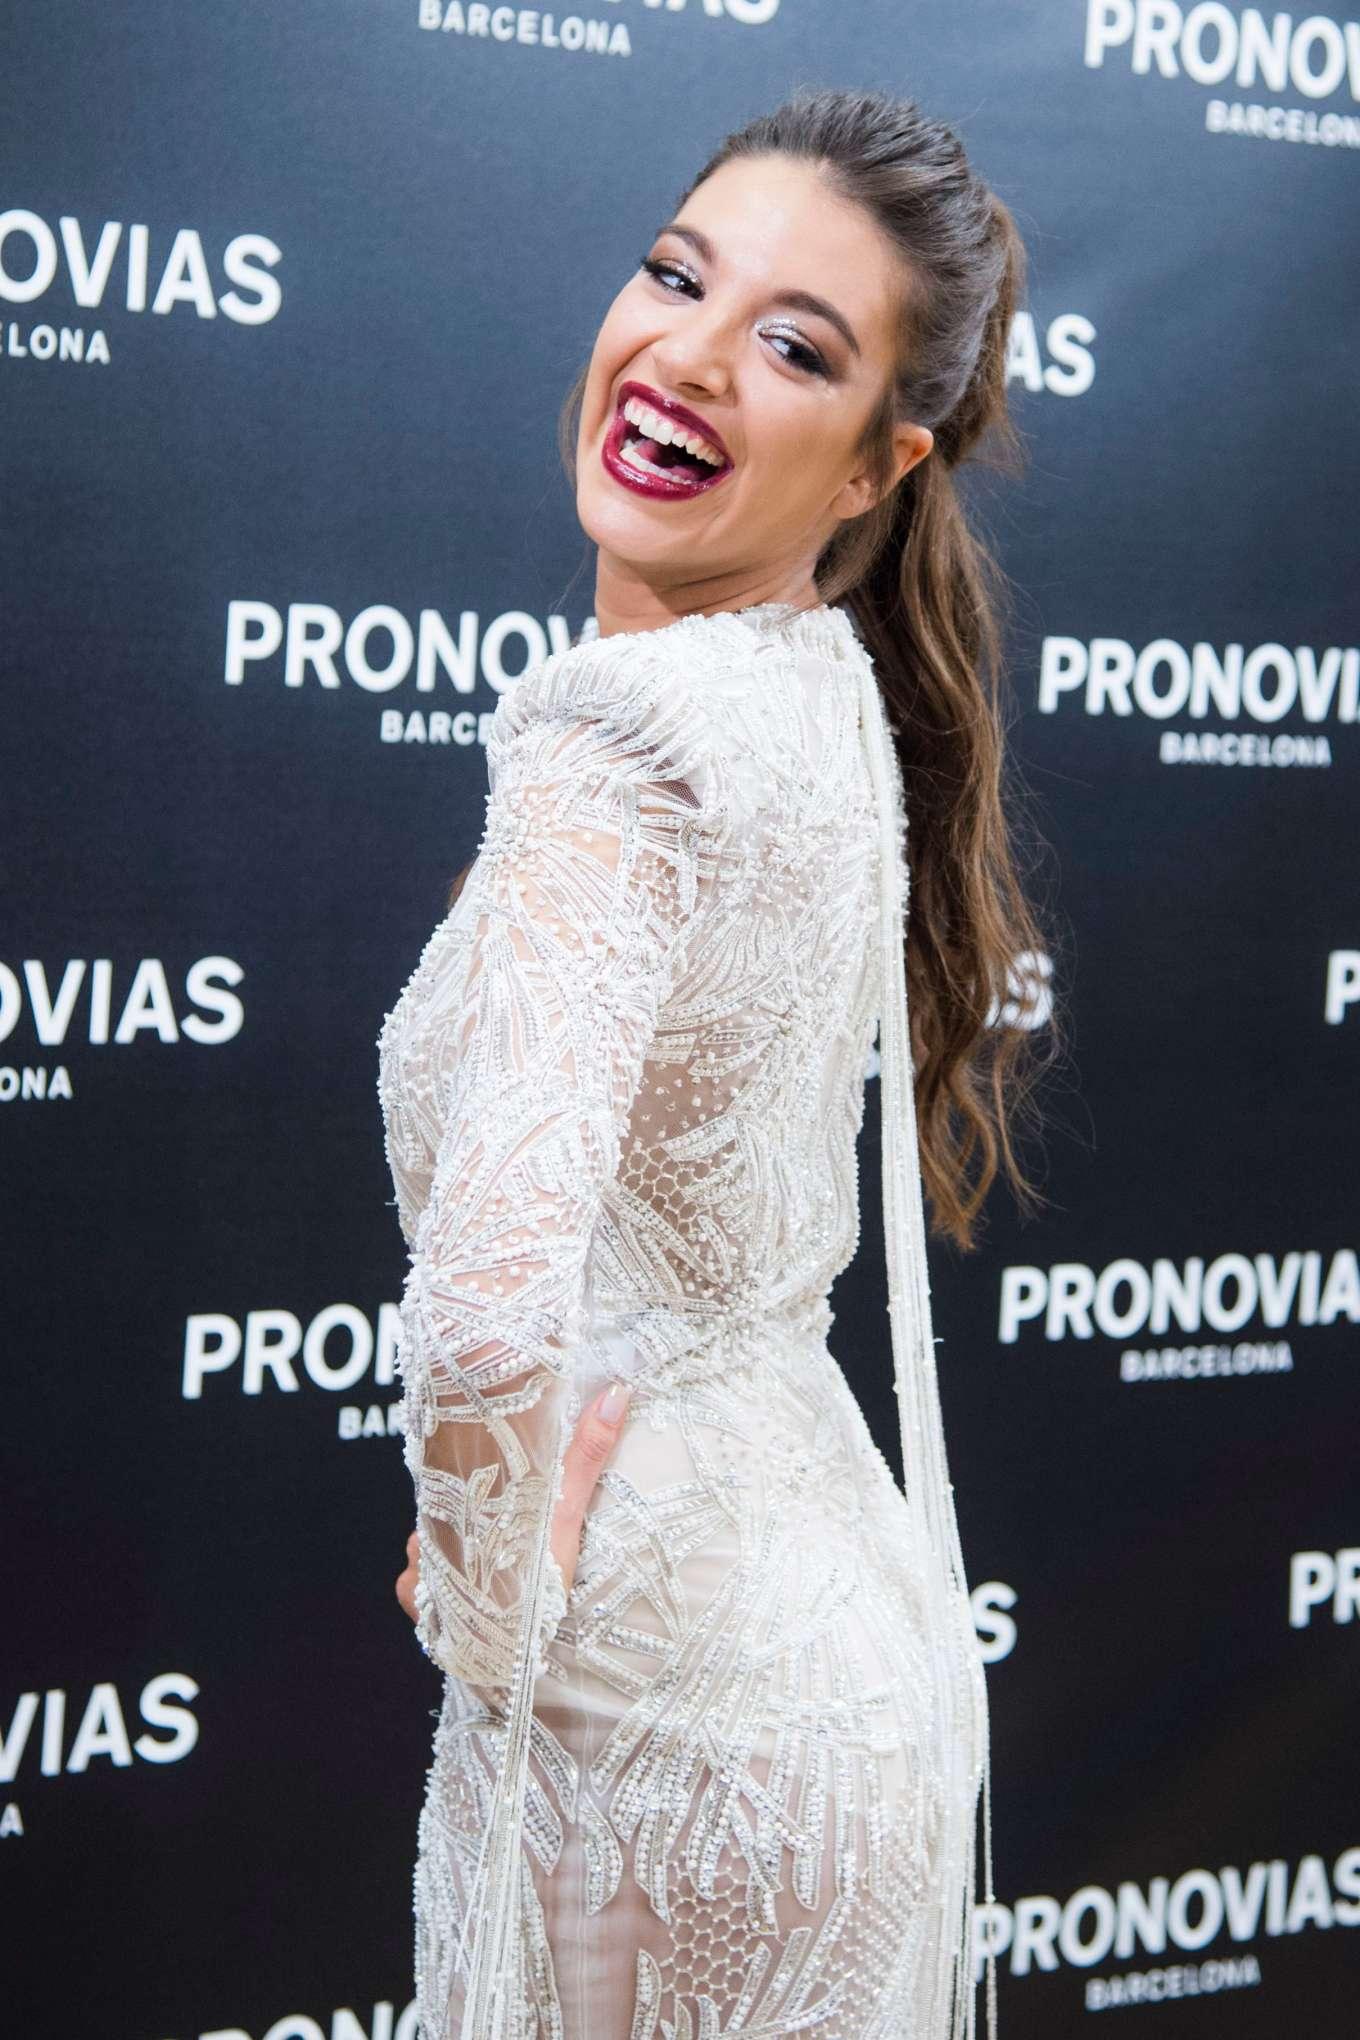 Ana Guerra 2019 : Ana Guerra – Pronovias Collection Photocall in Madrid-18